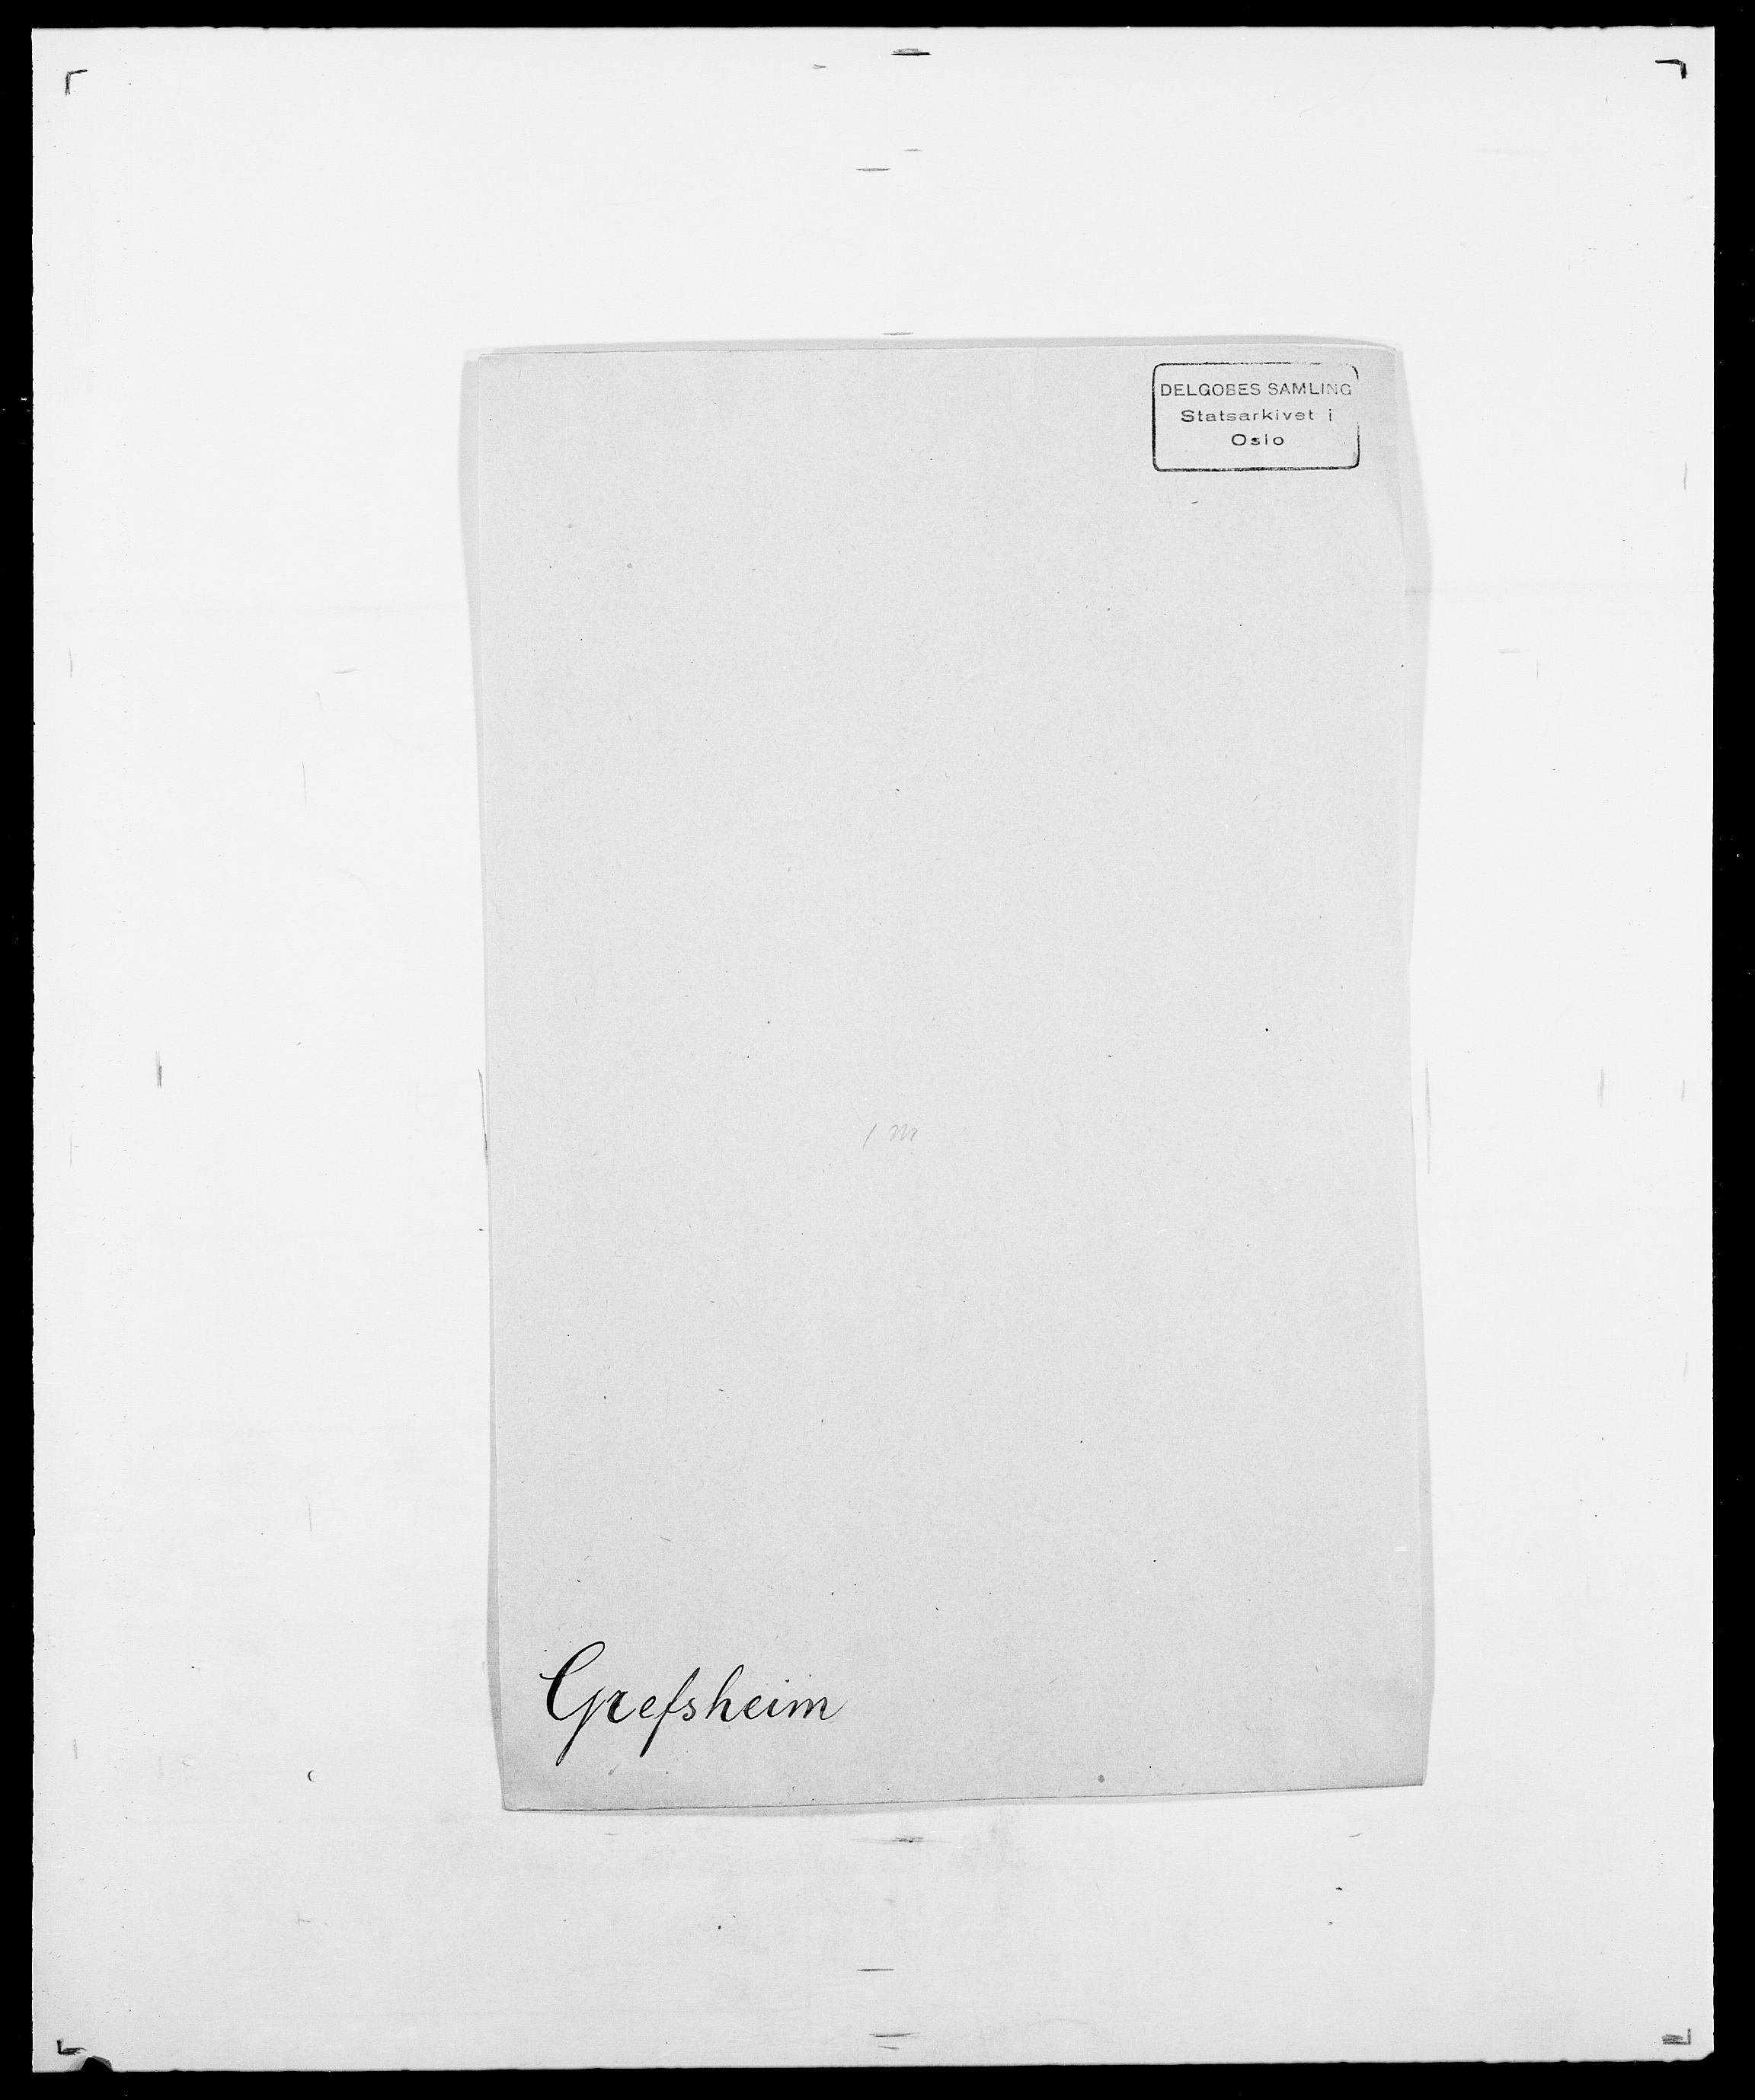 SAO, Delgobe, Charles Antoine - samling, D/Da/L0014: Giebdhausen - Grip, s. 589